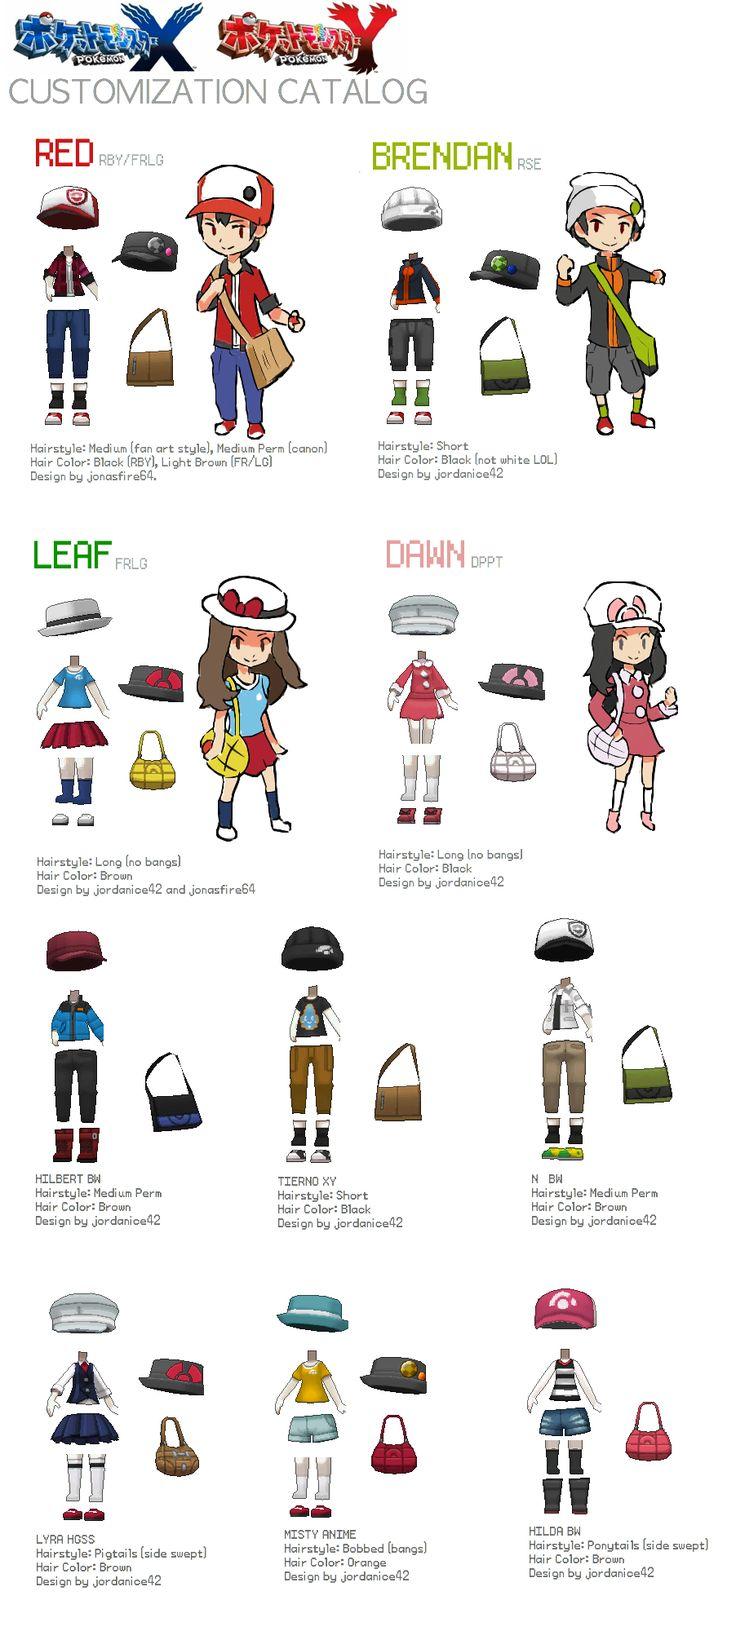 Pokemon XY Character Customization Catalog! by jordanice42.deviantart.com on @DeviantArt